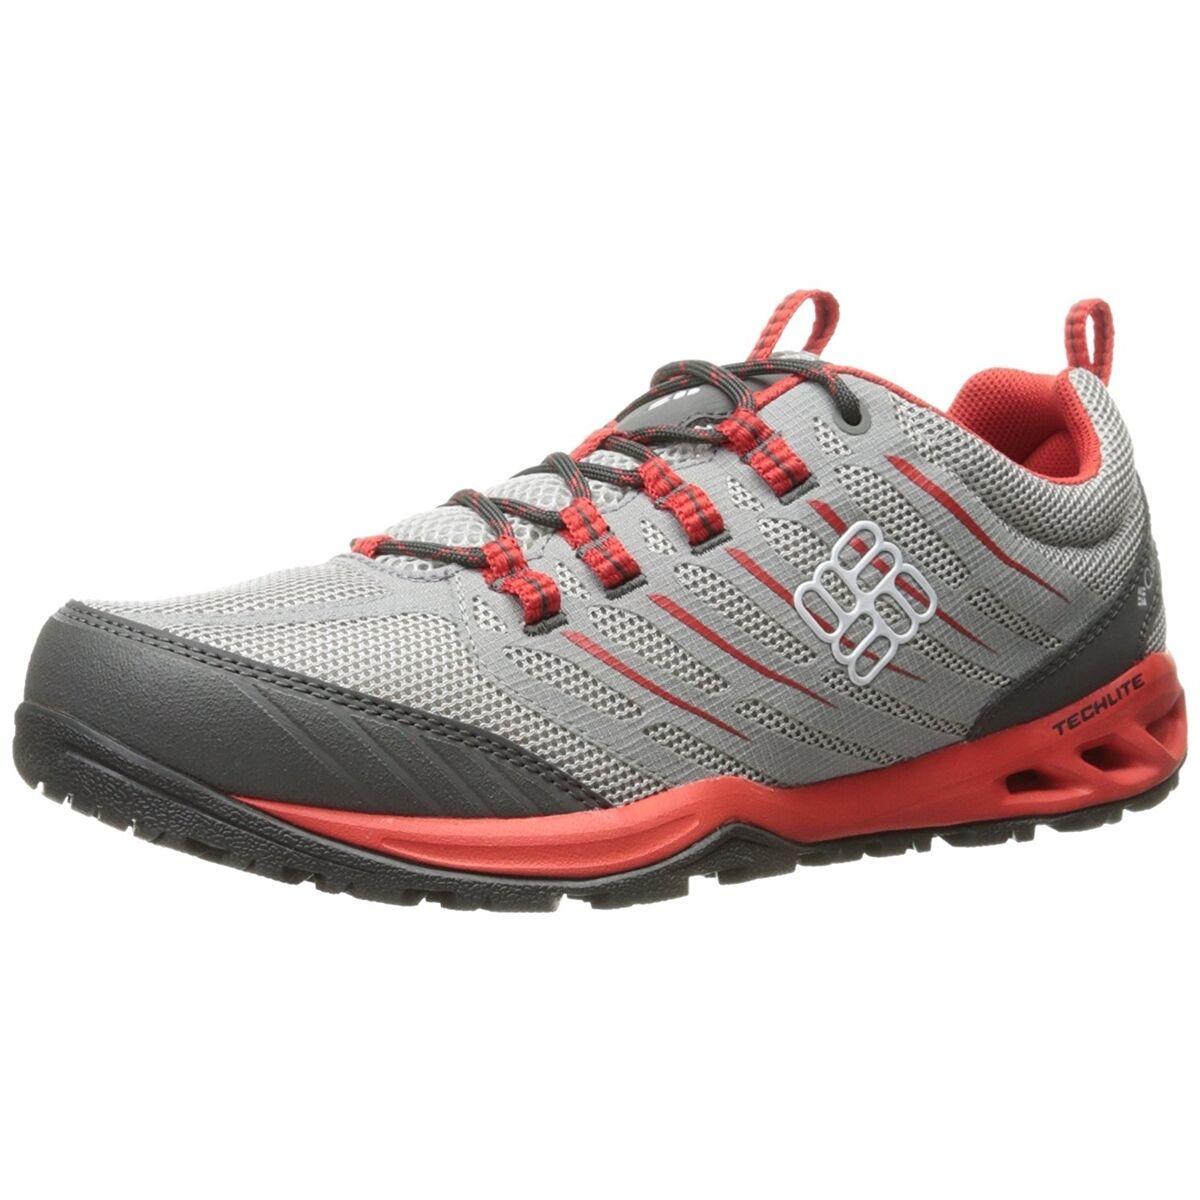 hommes Columbia Ventrailia Razor Multisport Chaussures Cool Gris Sneakers NEW